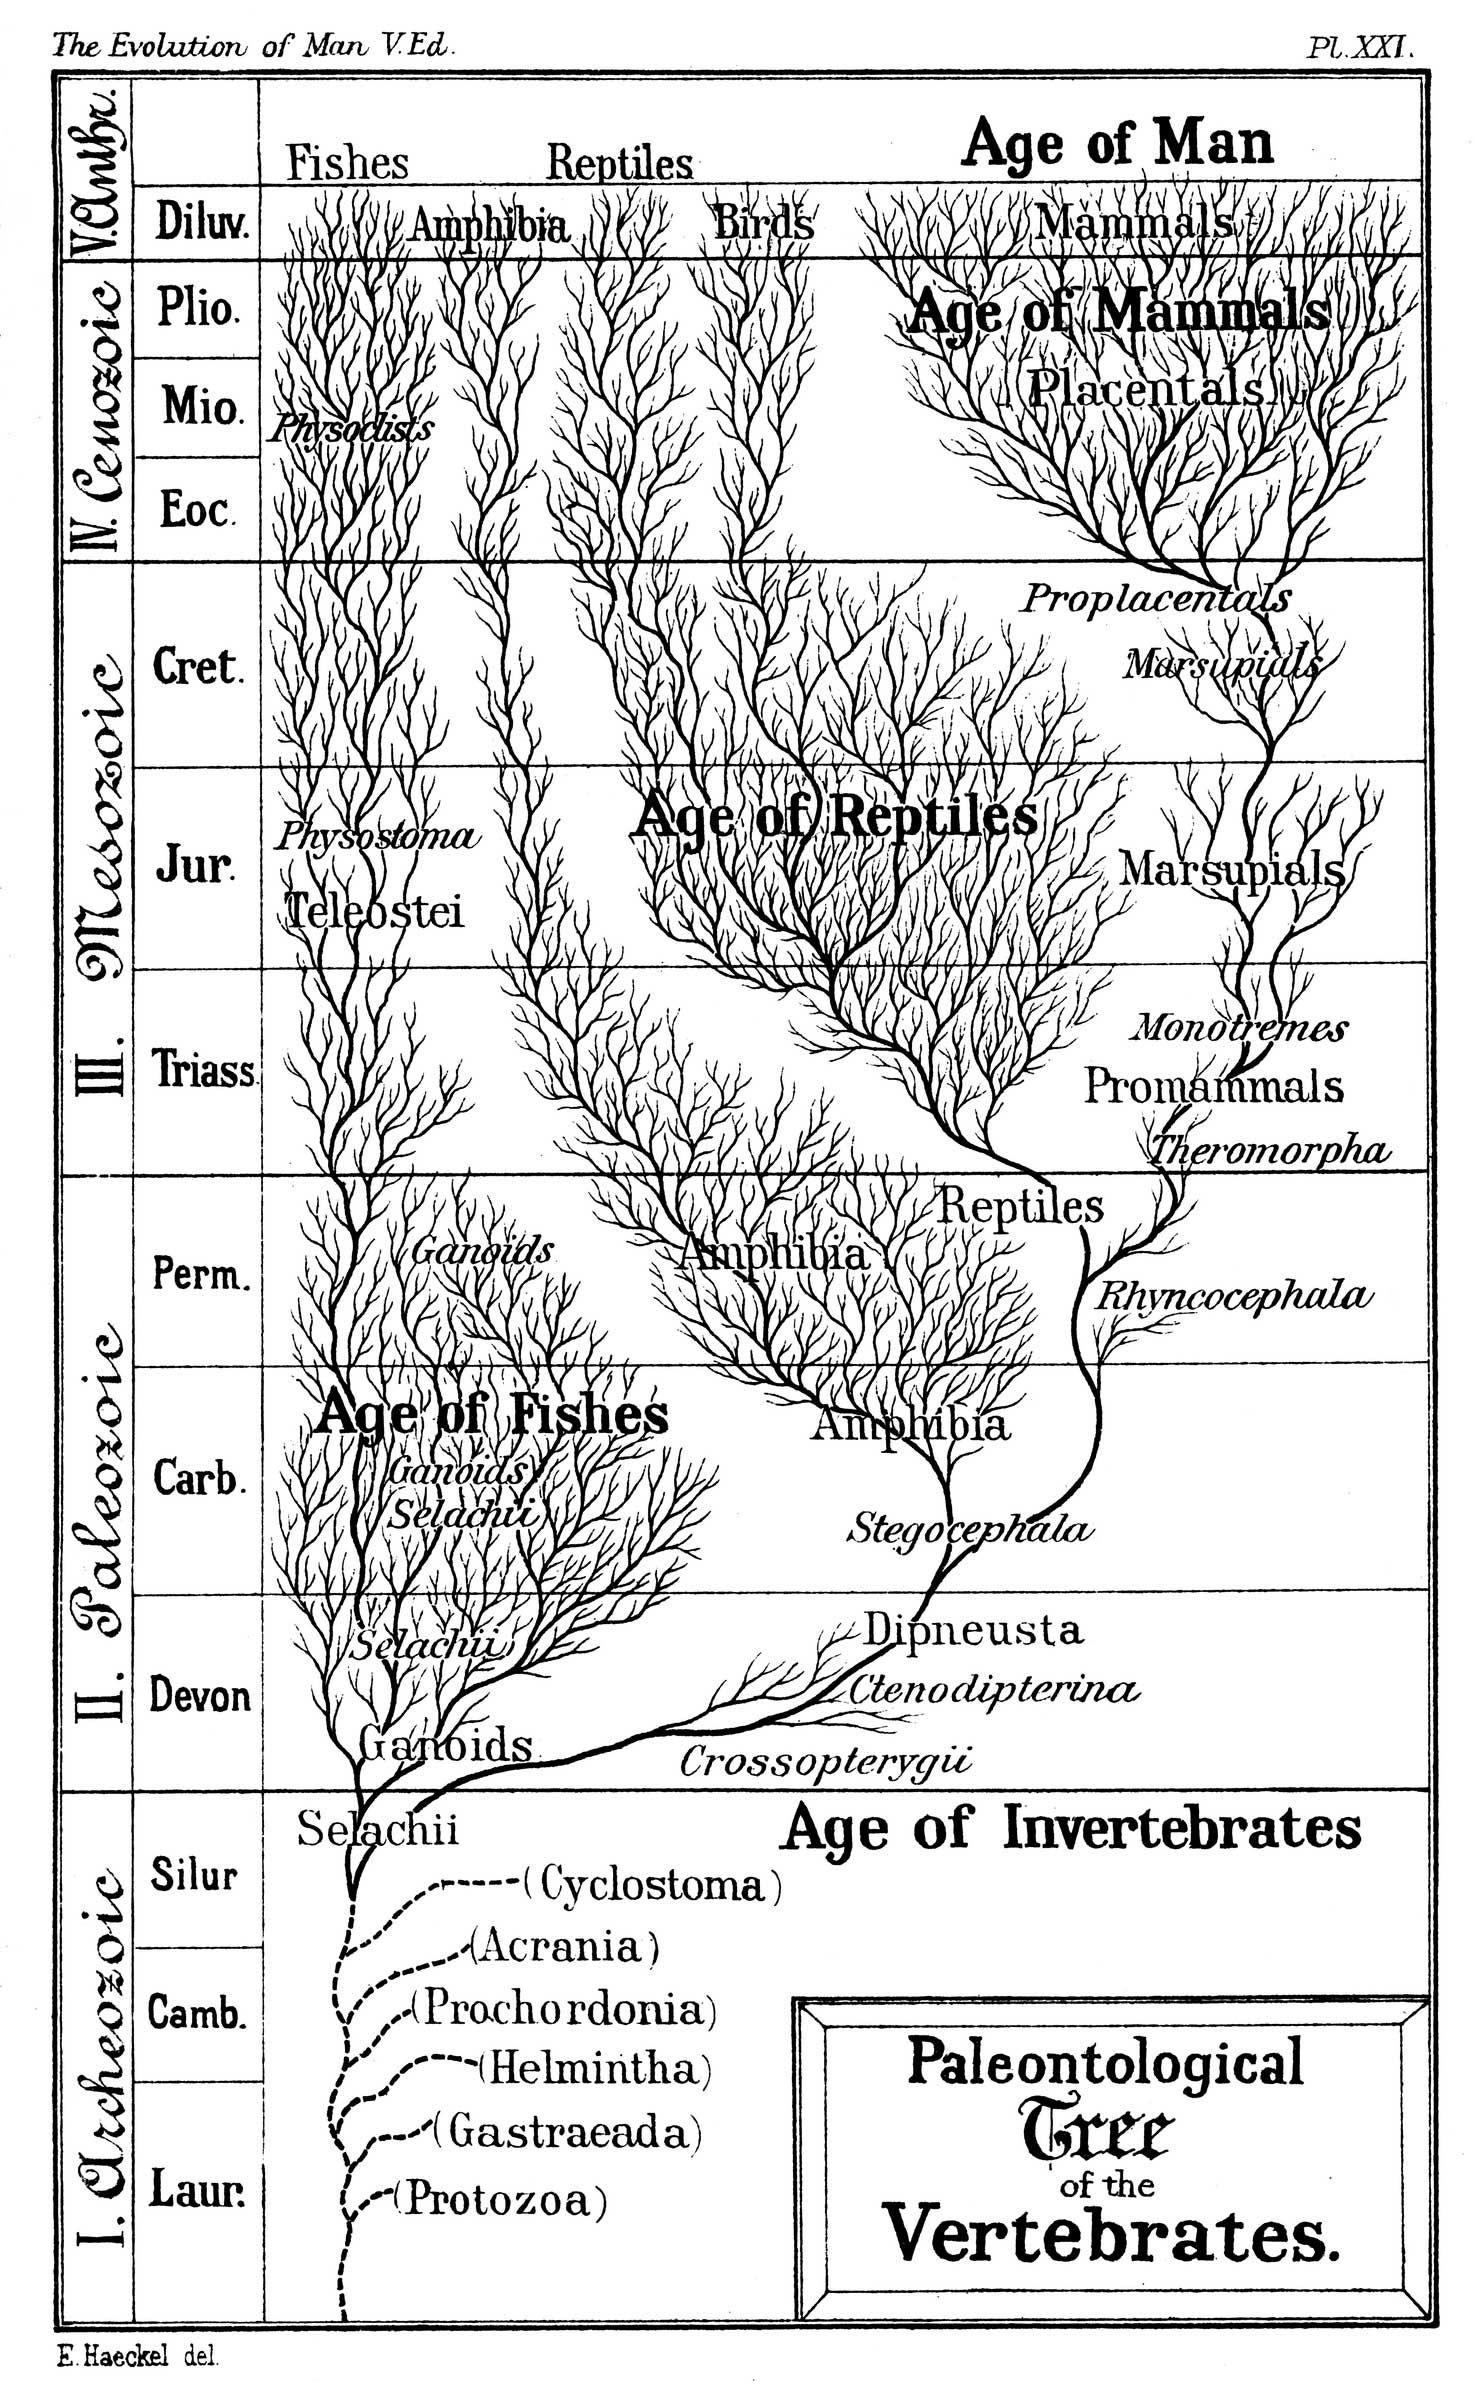 Haeckel S Paleontological Tree Of Vertebrates C